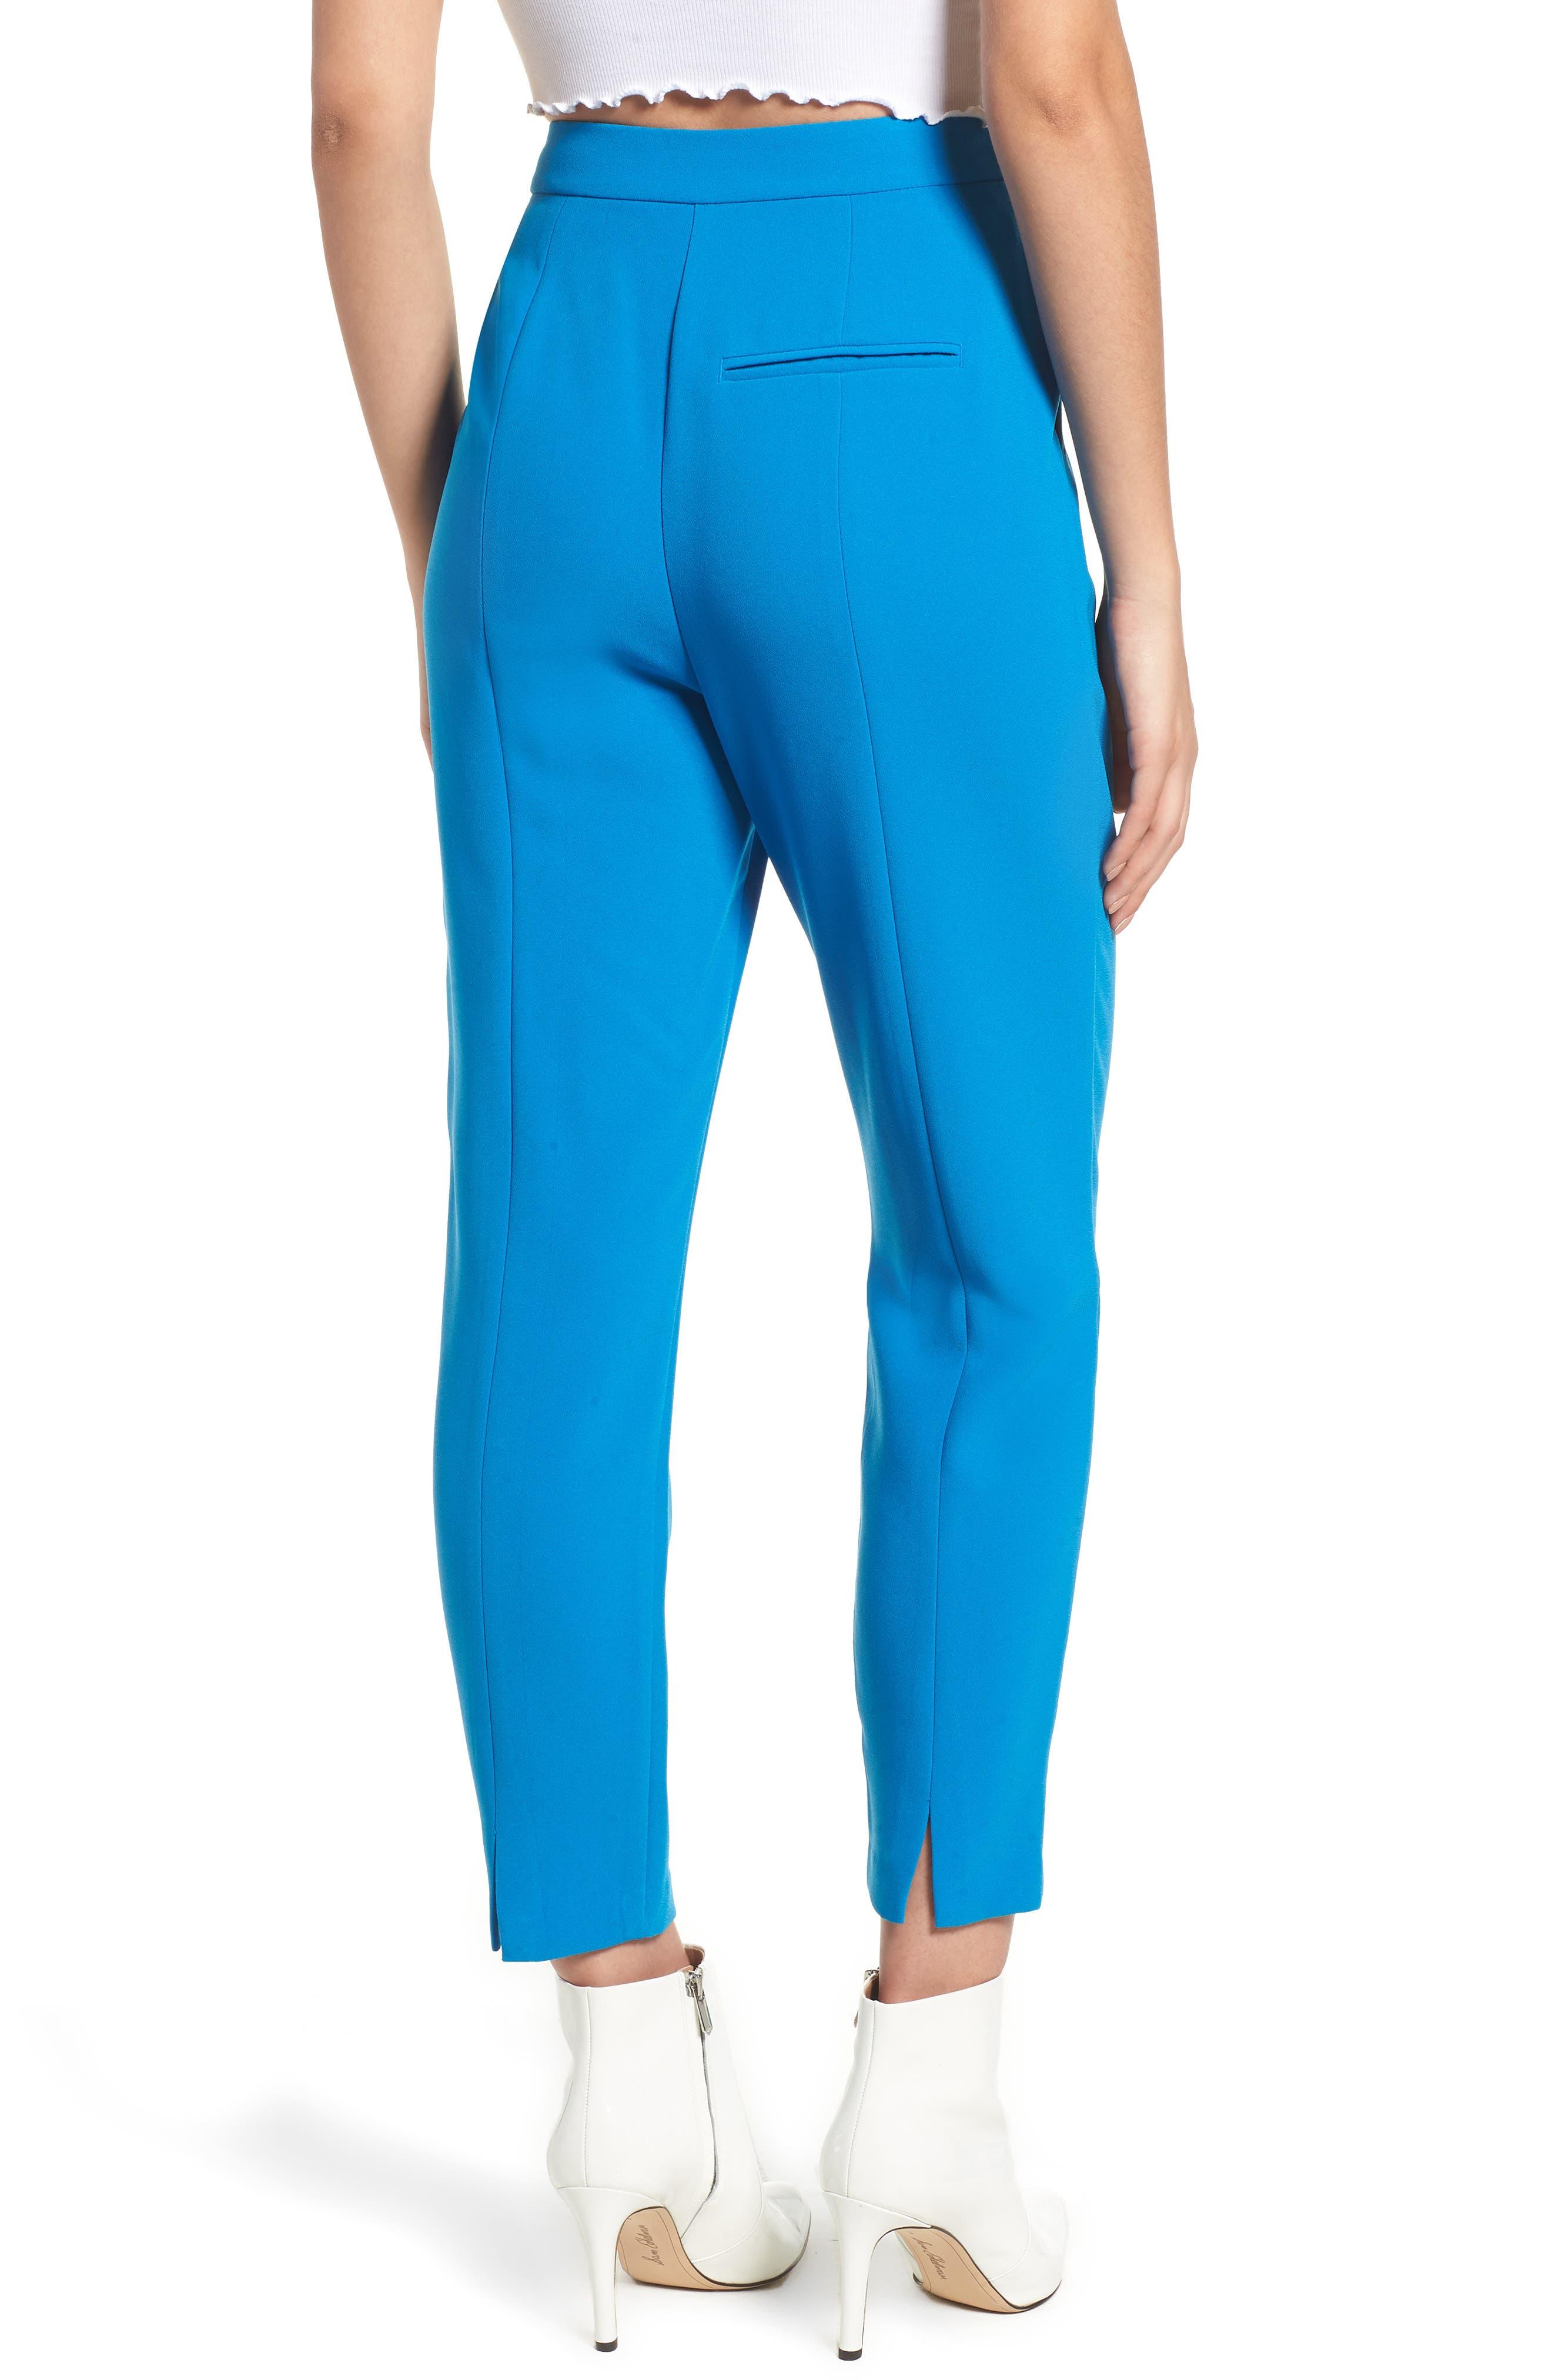 Clara Peg Belted Trousers,                             Alternate thumbnail 2, color,                             Cobalt